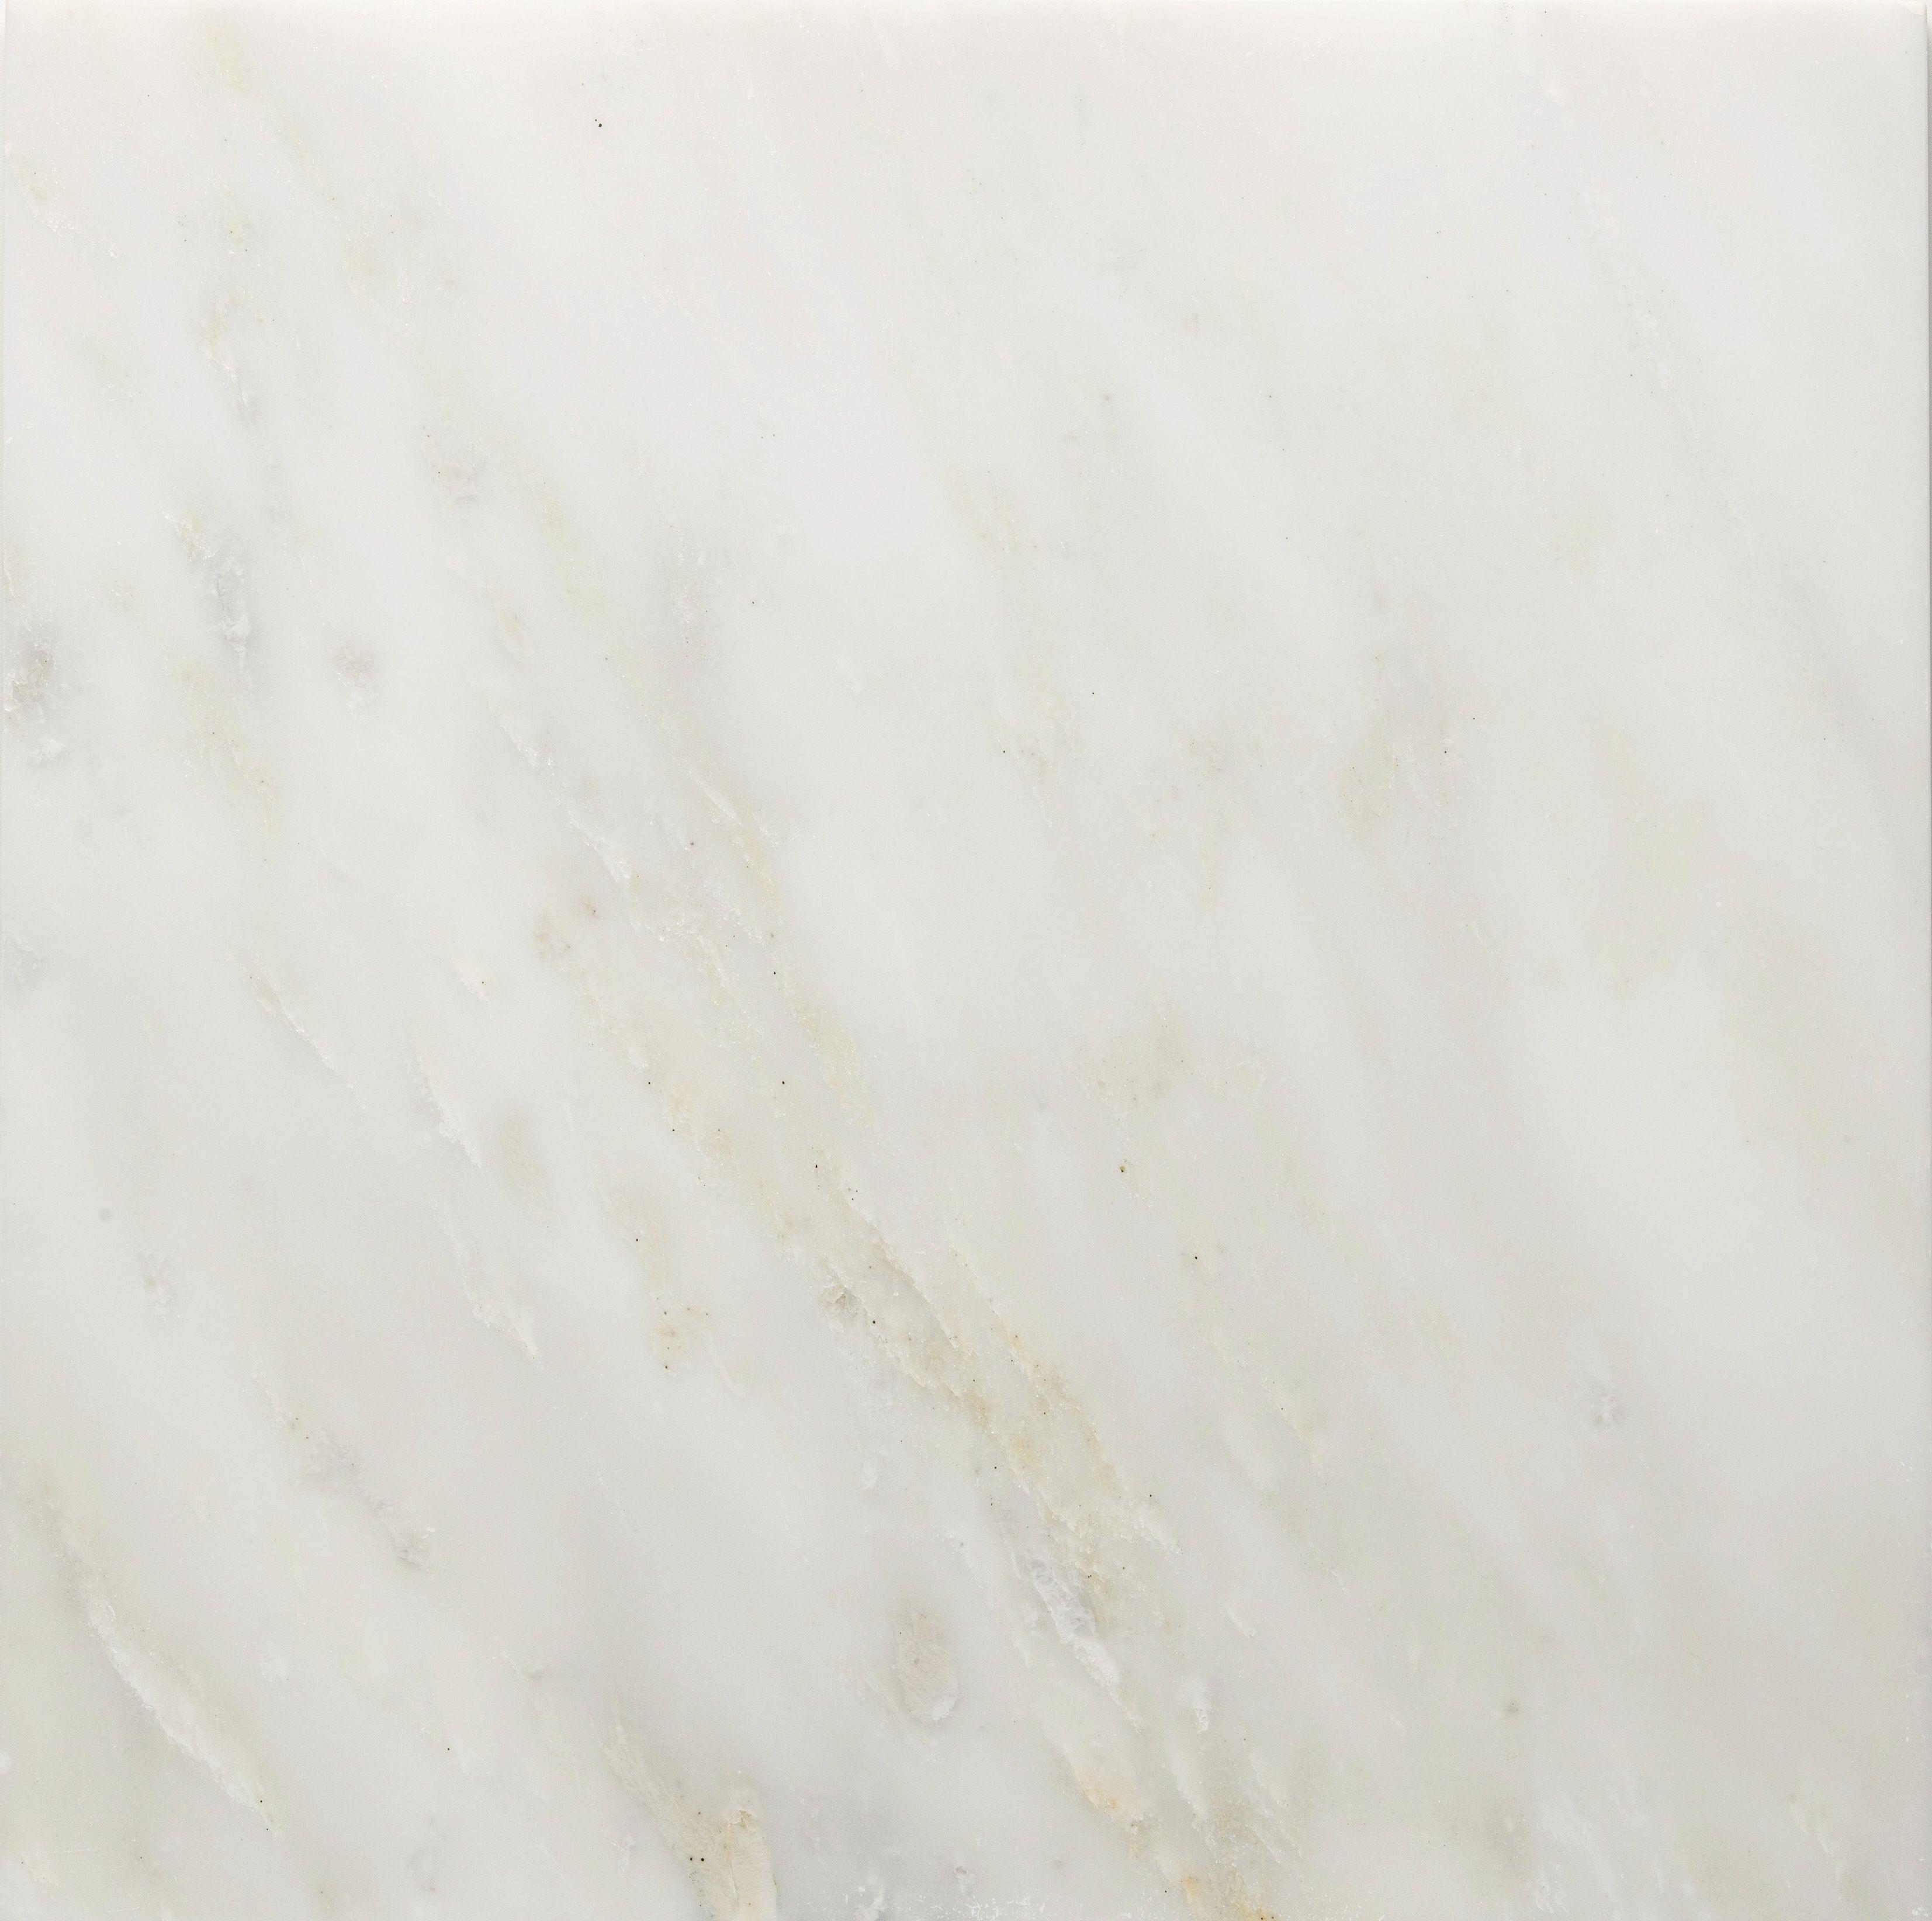 Calacatta Chablis Marble Tileswhite